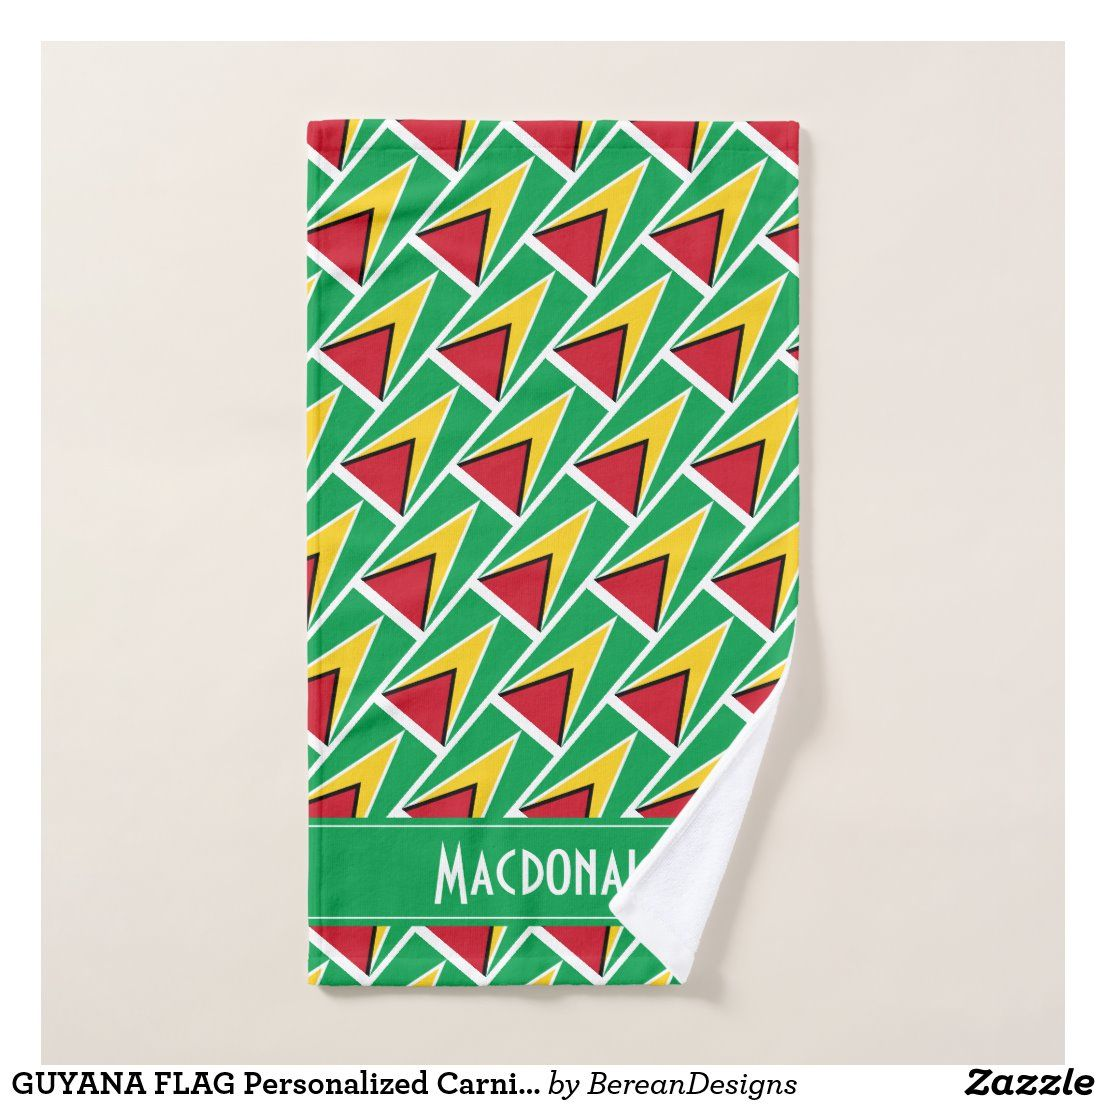 Guyana Flag Personalized Carnival Sports Hand Towel Zazzle Com